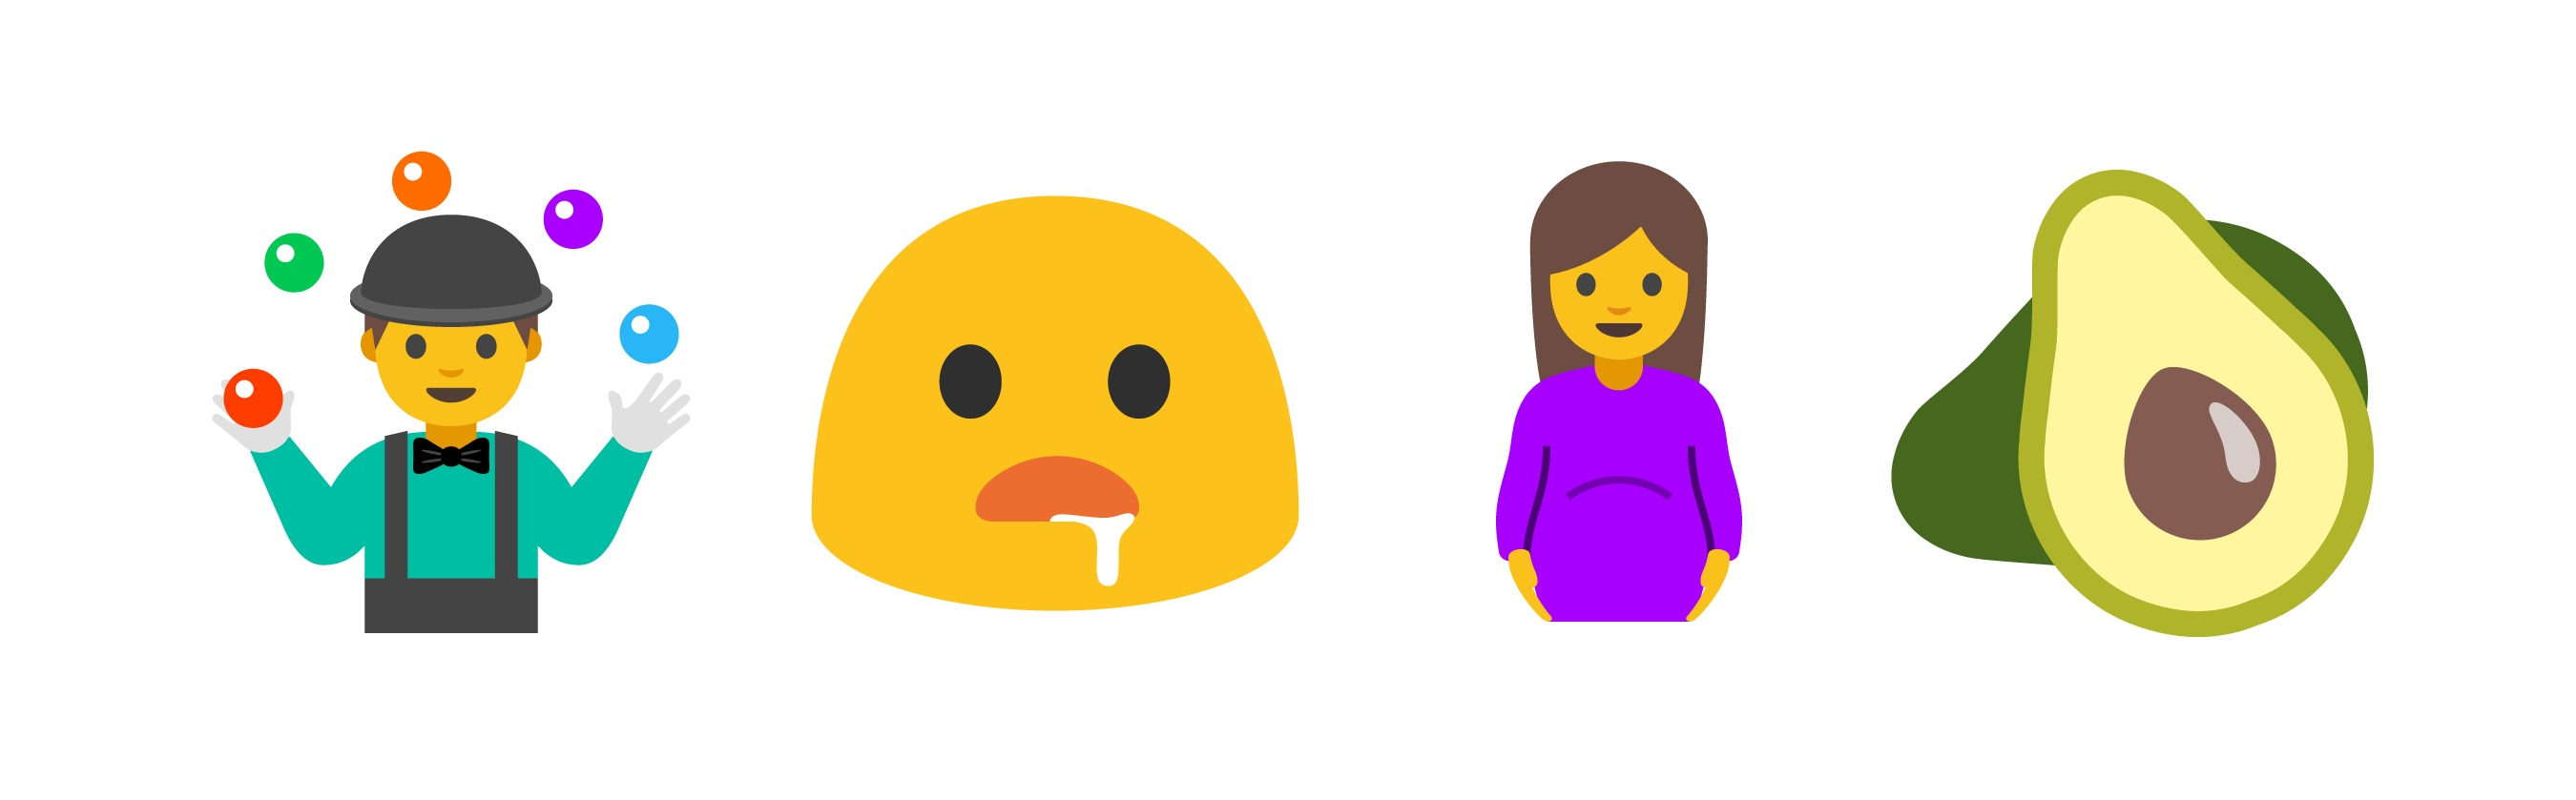 Android 70 Nougat Emoji Changelog